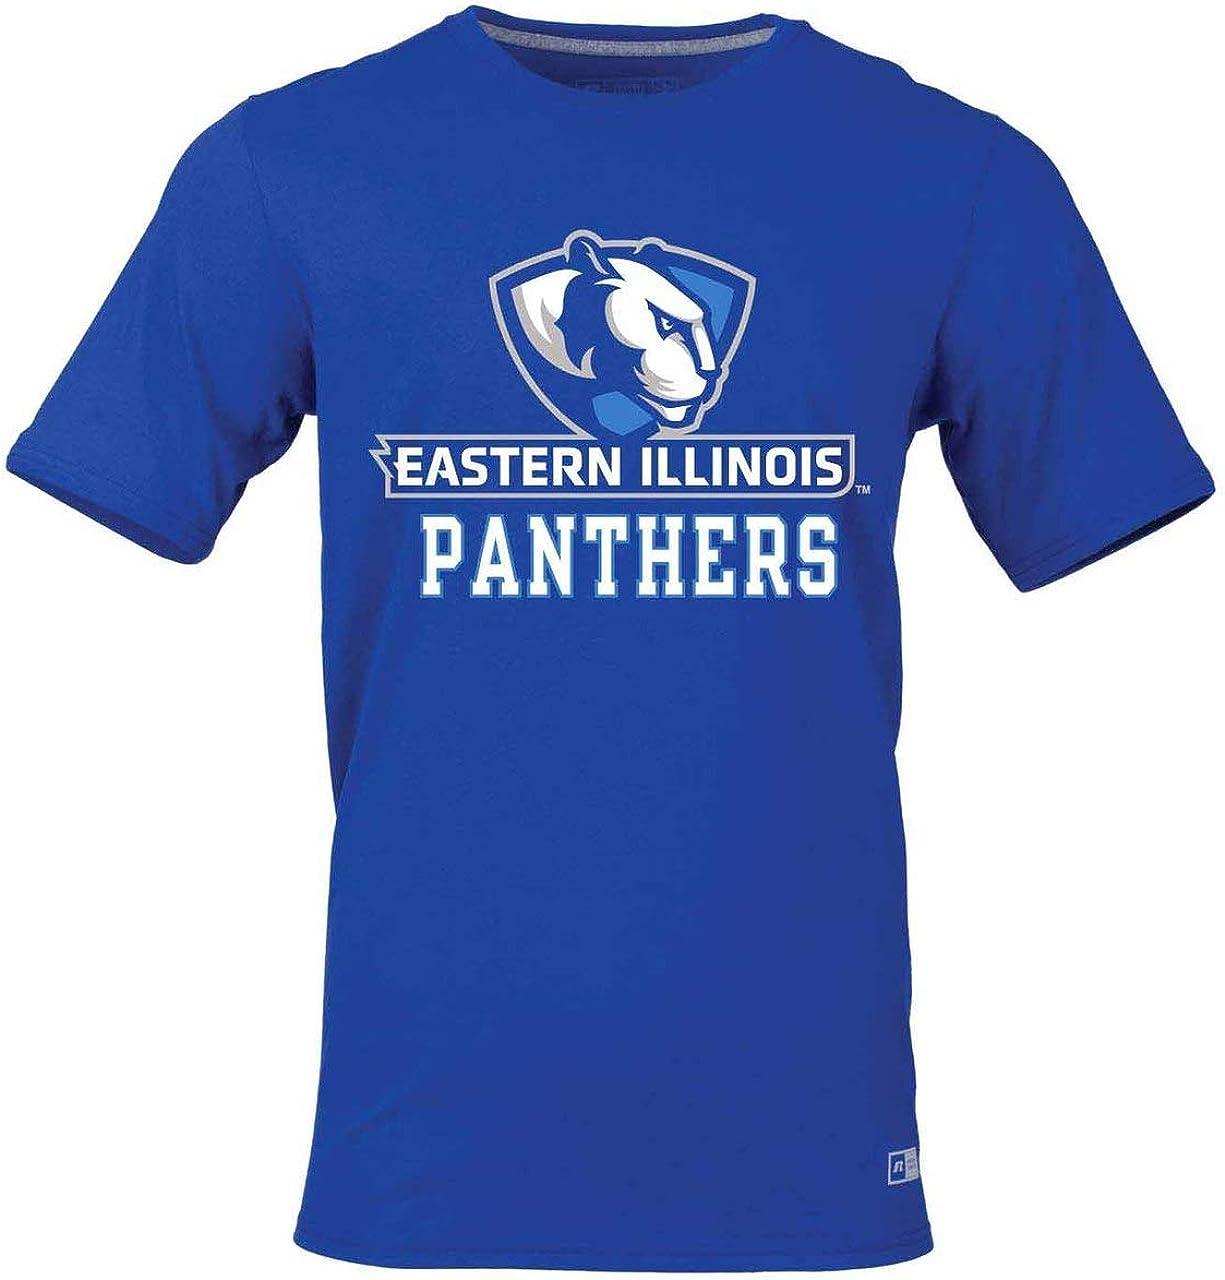 NCAA Eastern Illinois Panthers T-Shirt V1